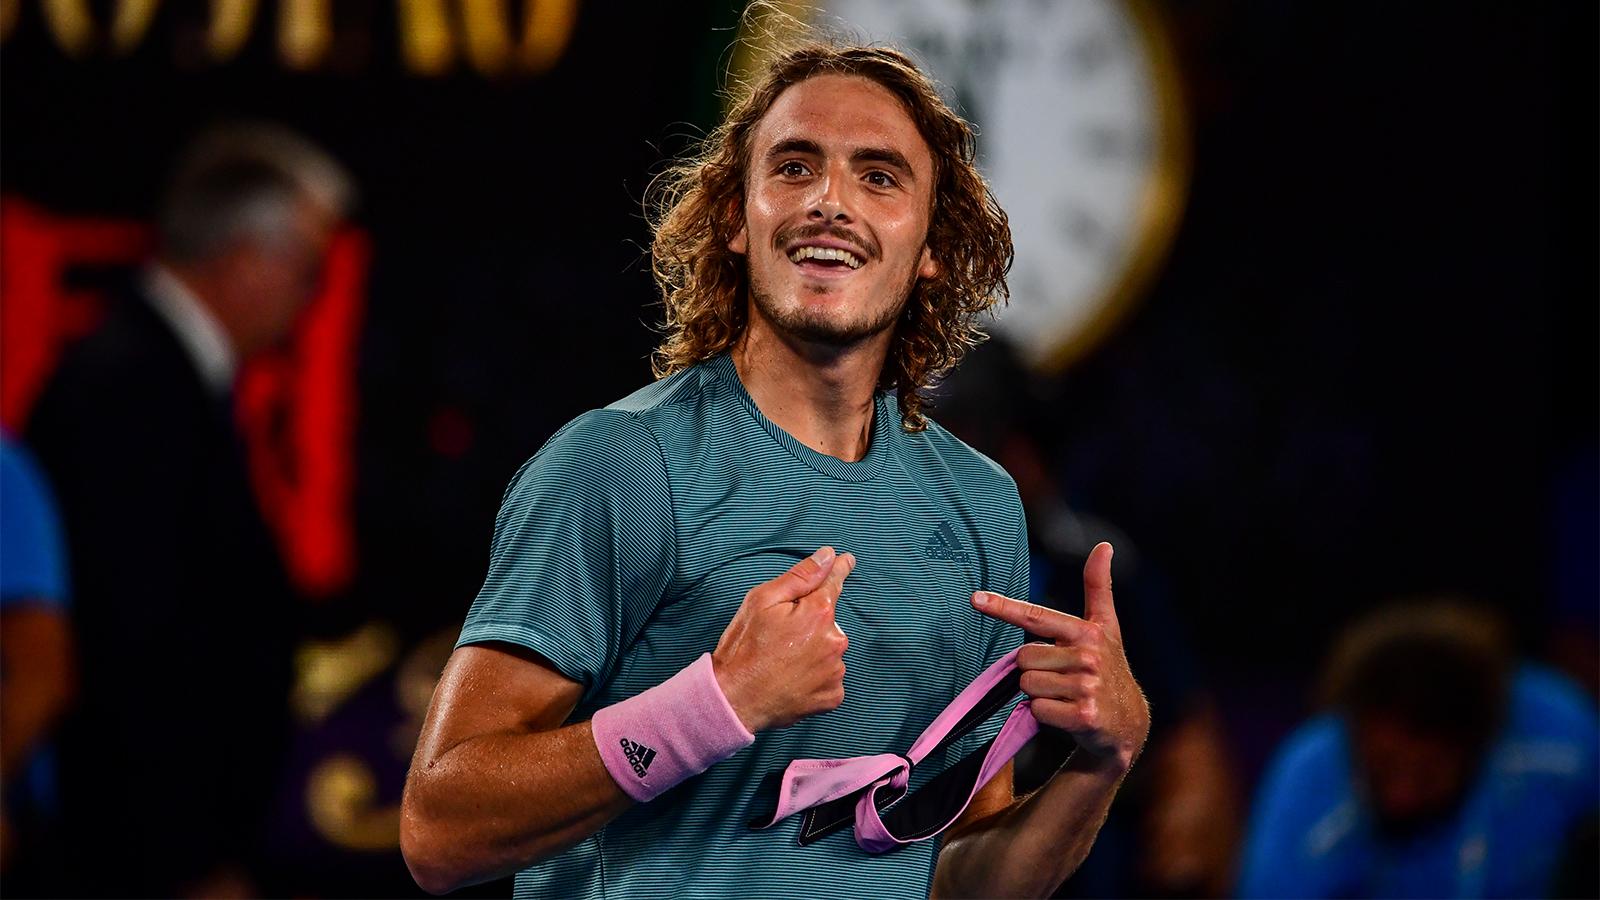 Fortes emoções na 1ª semana de Australian Open; confira a análise